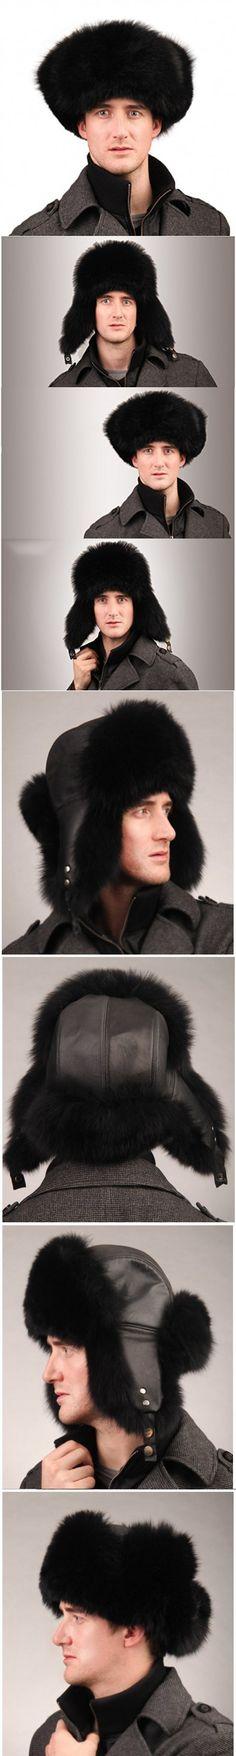 URSFUR Men's Fox Fur & Leather Trapper Hats (Black)